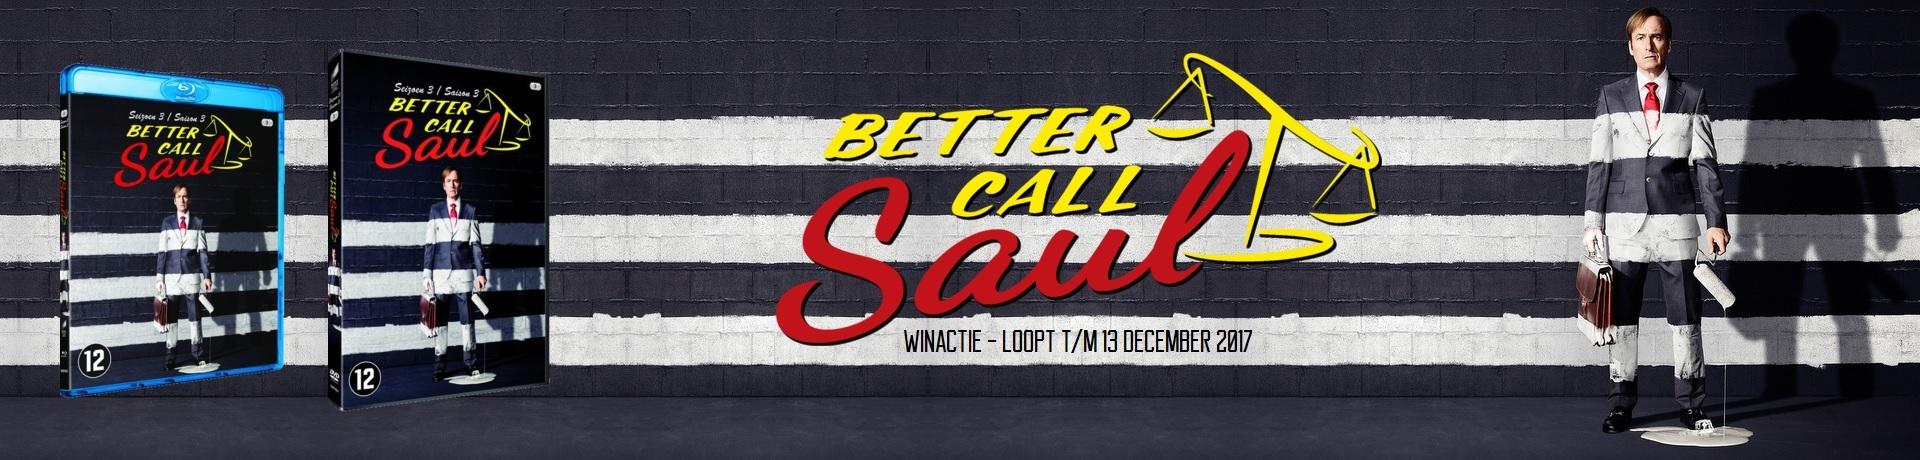 Better Call Saul - seizoen 3 WINACTIE